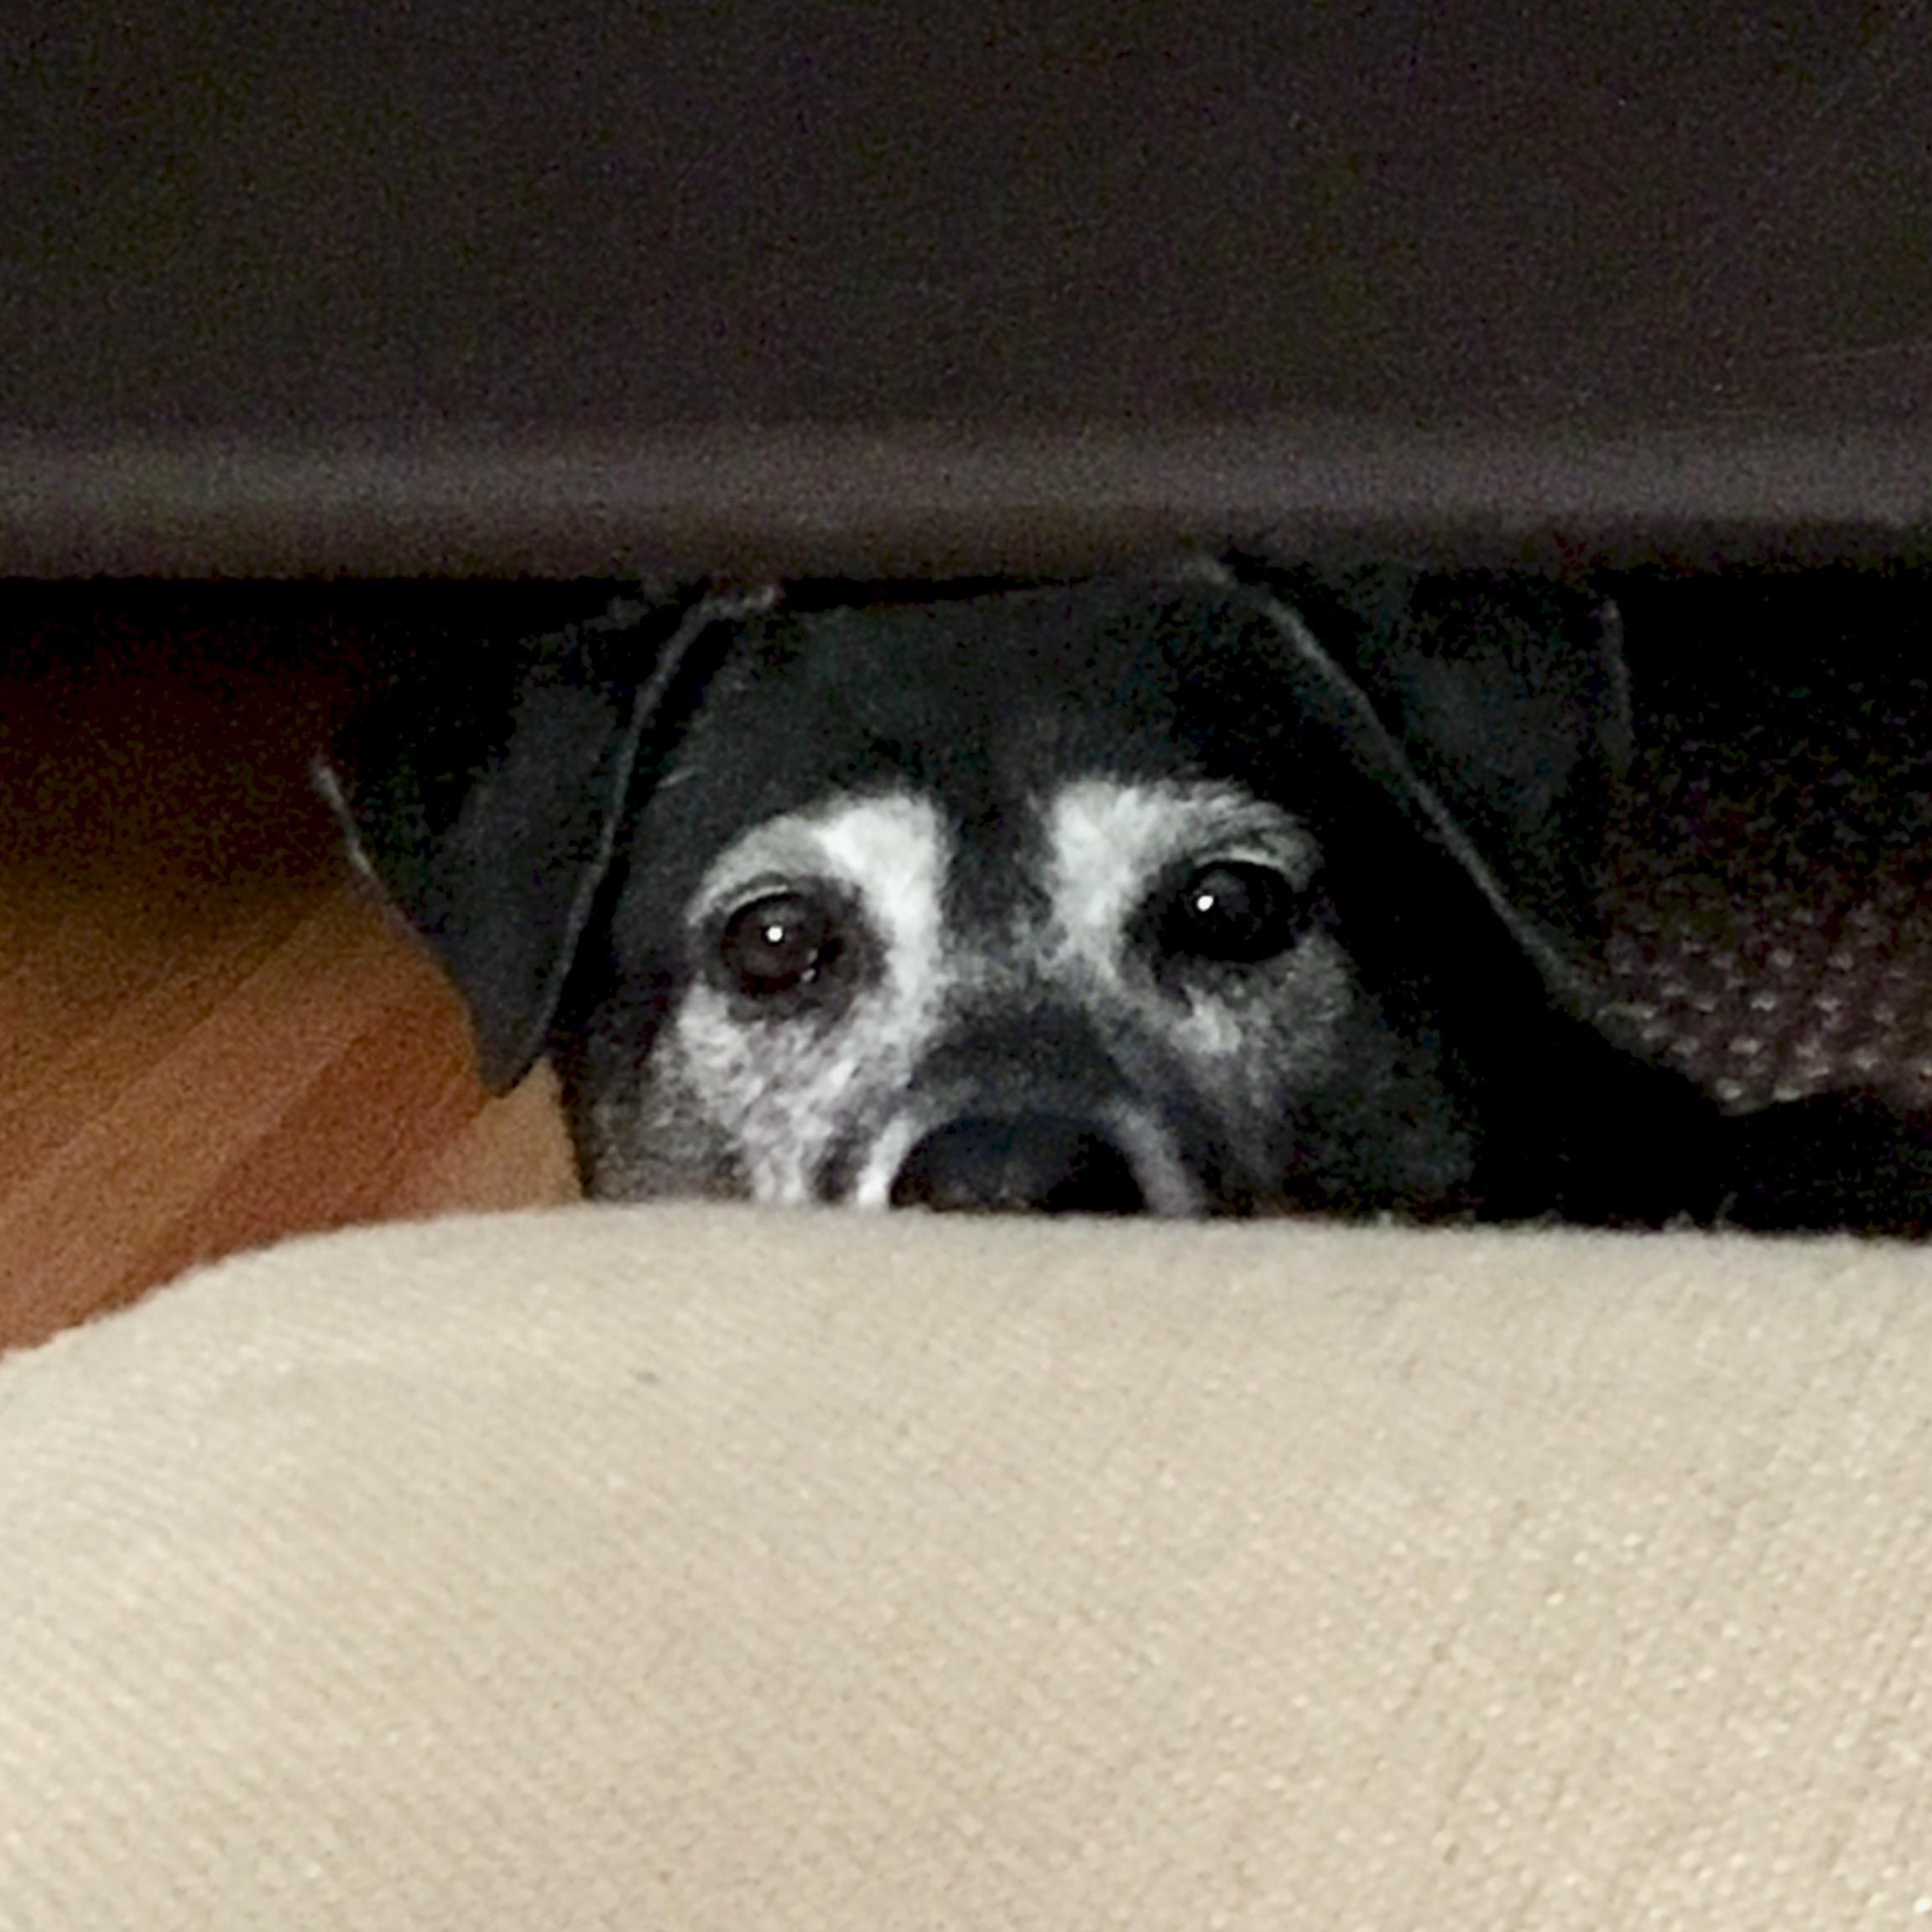 black dog peeking over edge of sofa